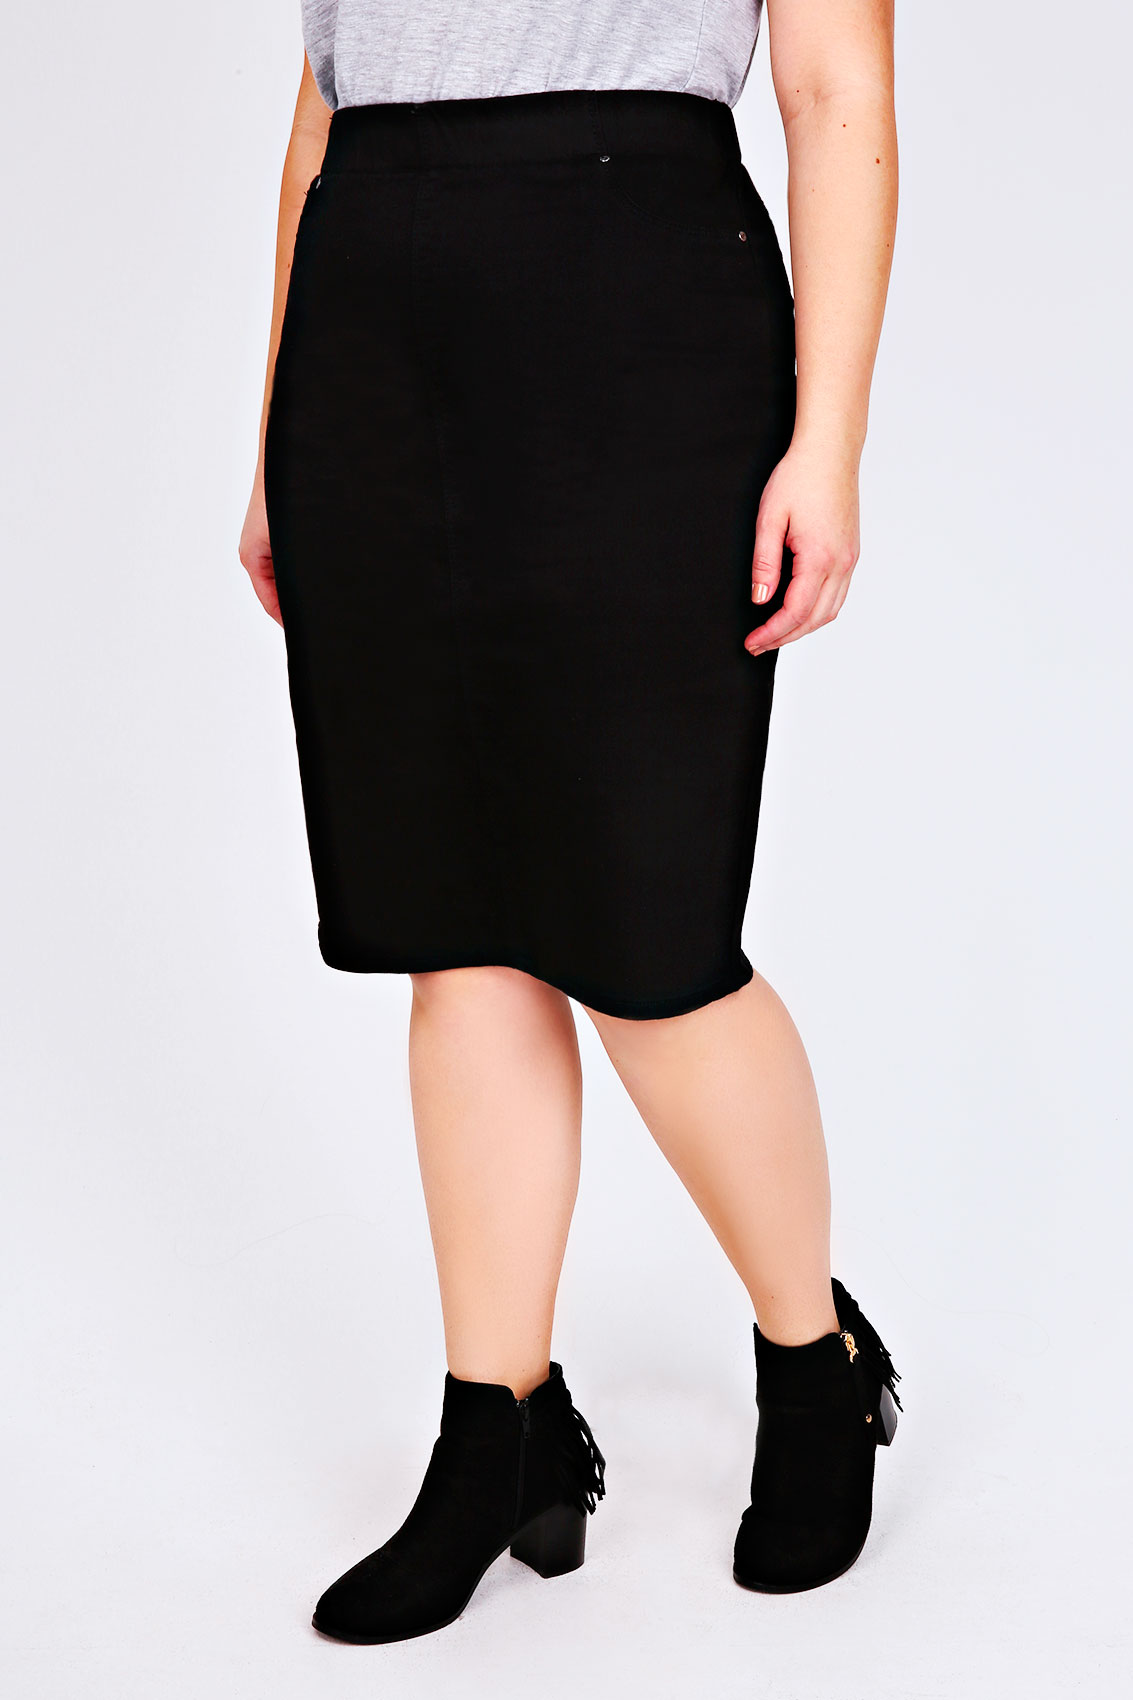 black denim pull on pencil skirt plus size 16 18 20 22 24